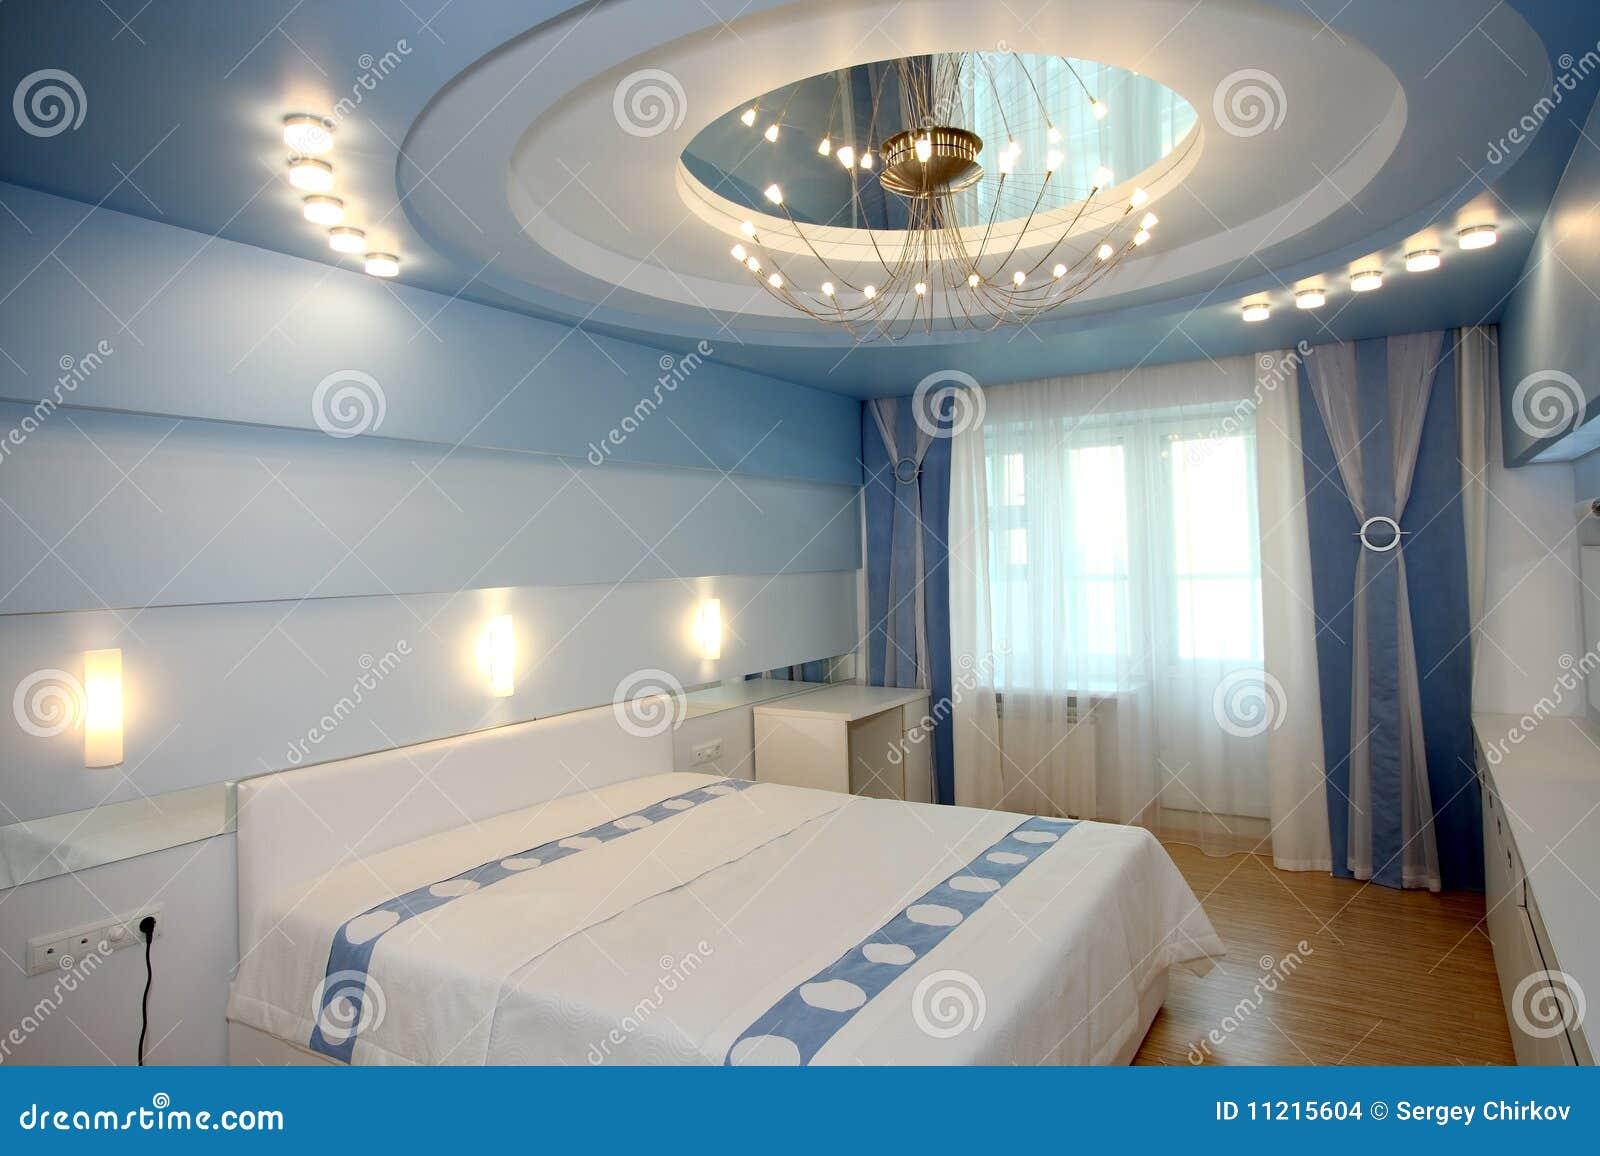 Schlafzimmer Im Hotel Stockbilder - Bild: 11215604